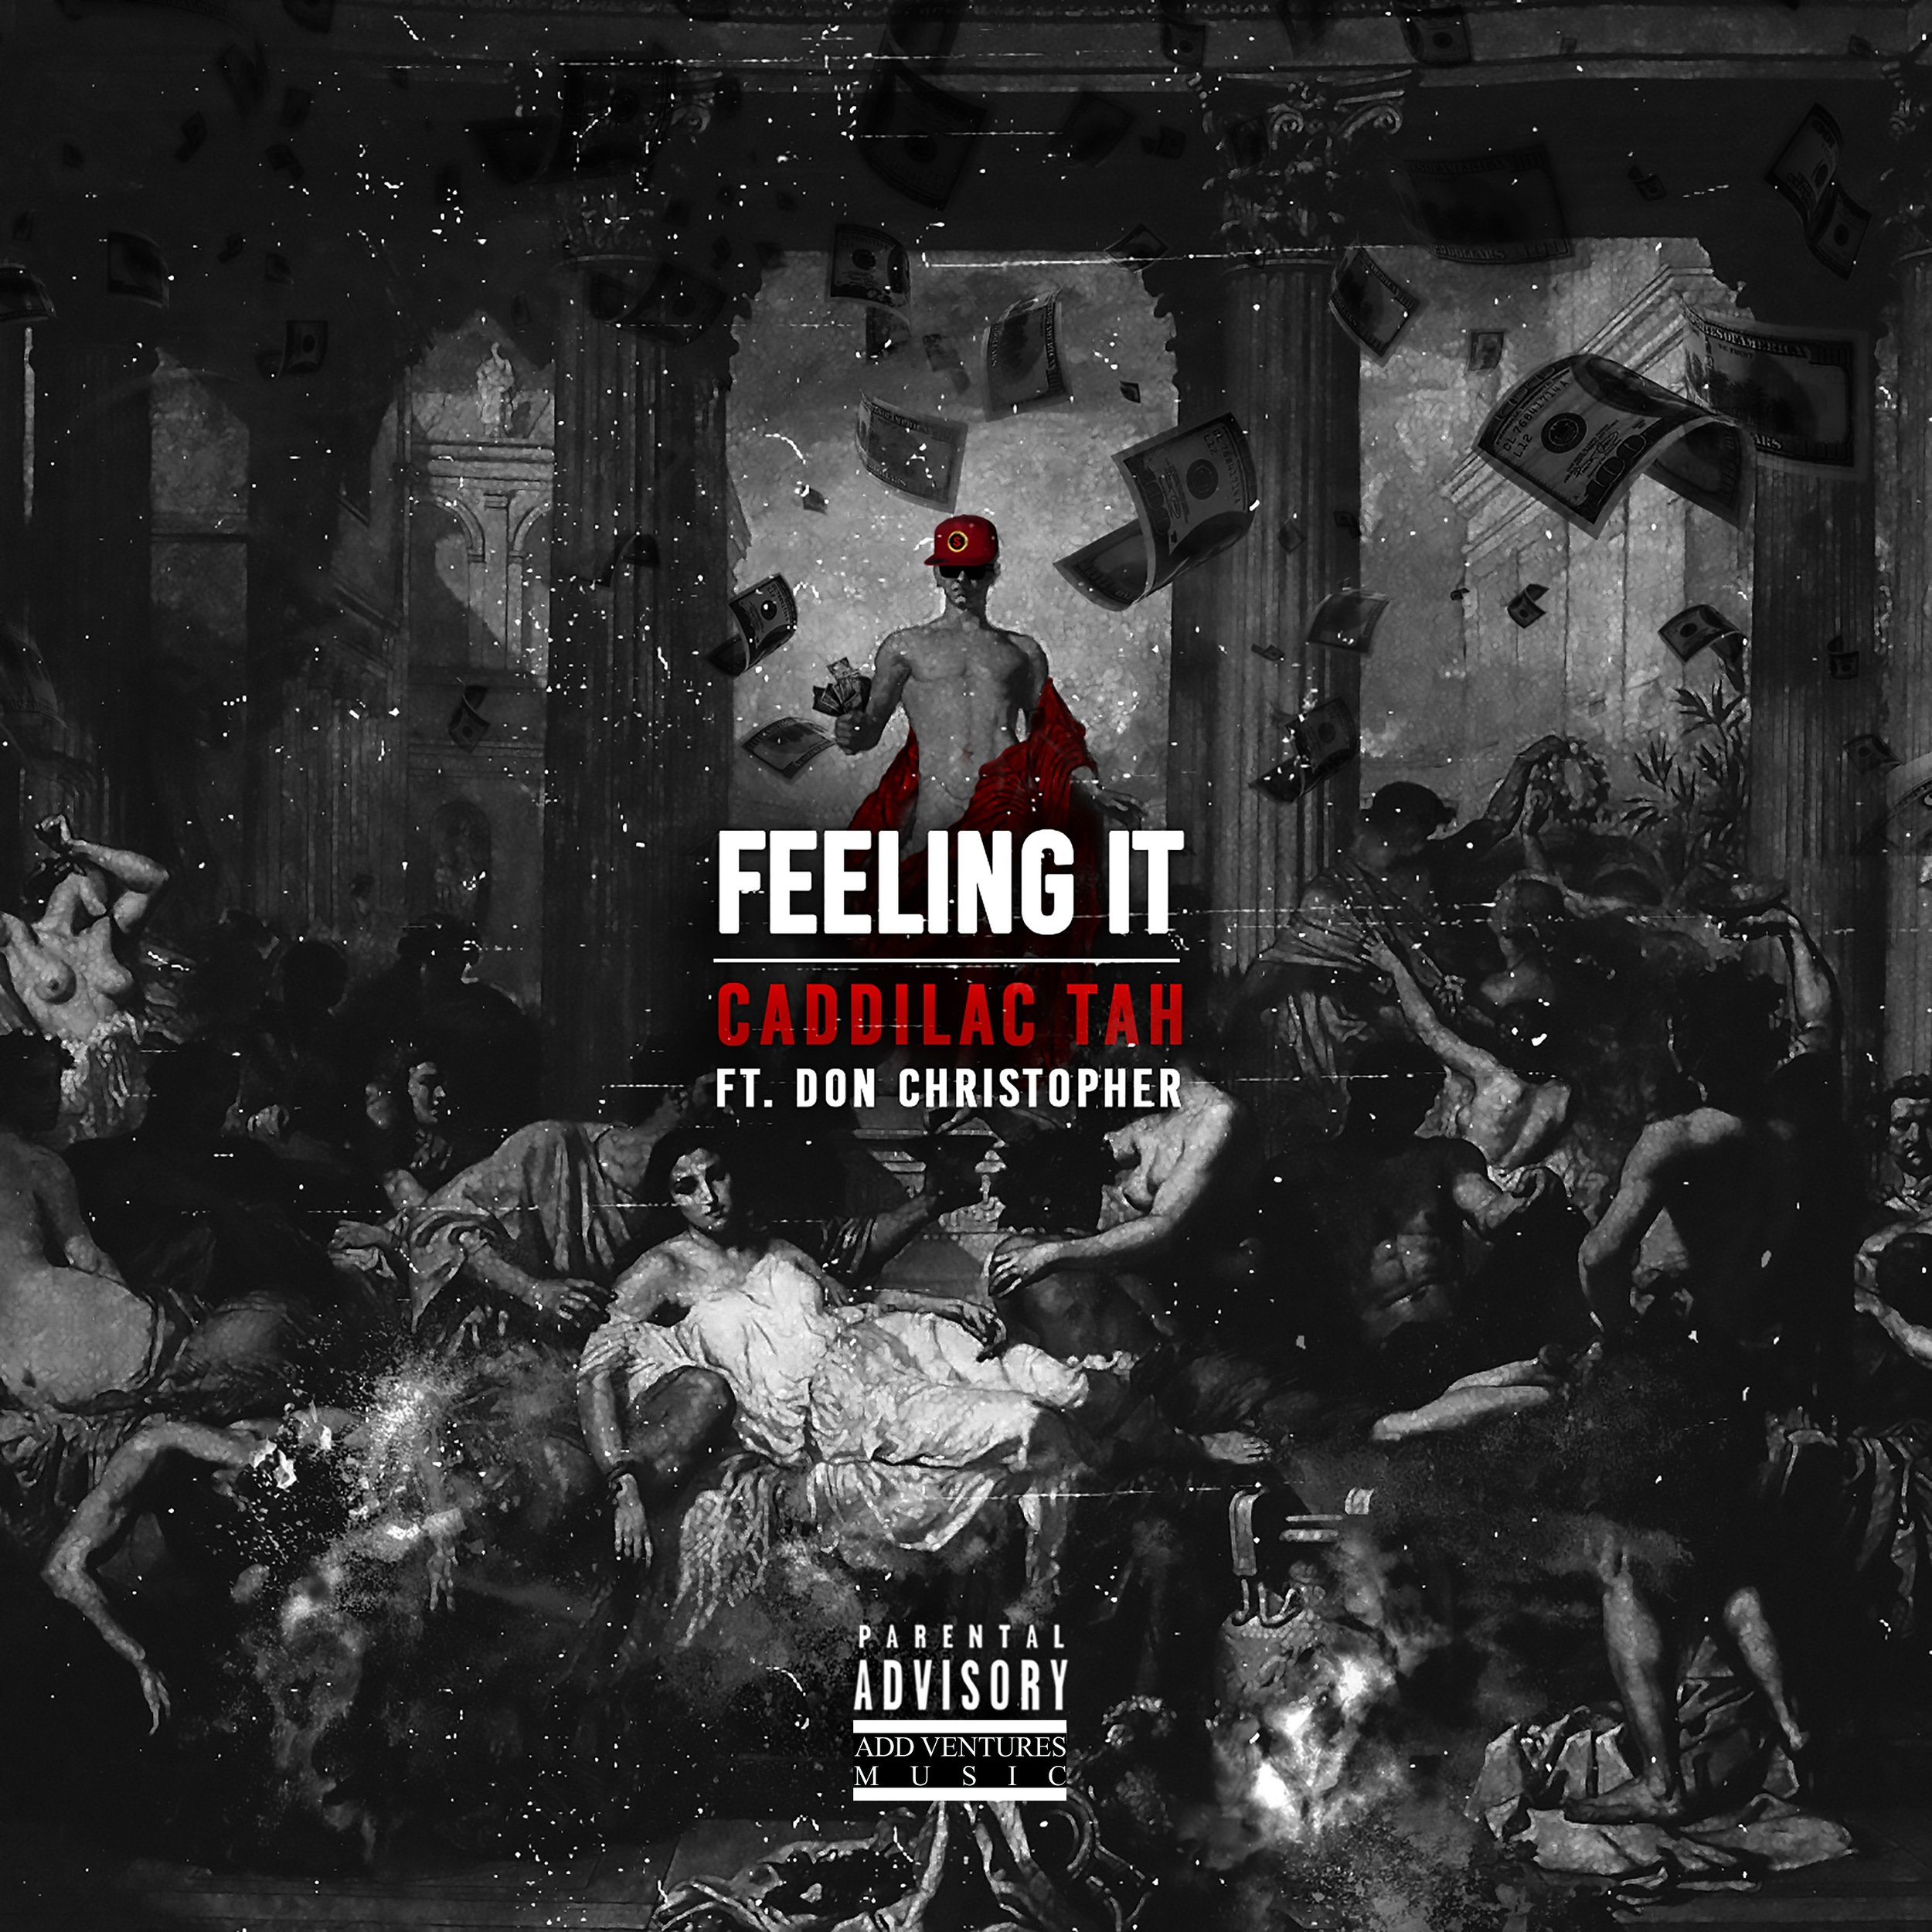 Caddilac Tah - Feeling It - Single Cover  - Explicit.jpeg